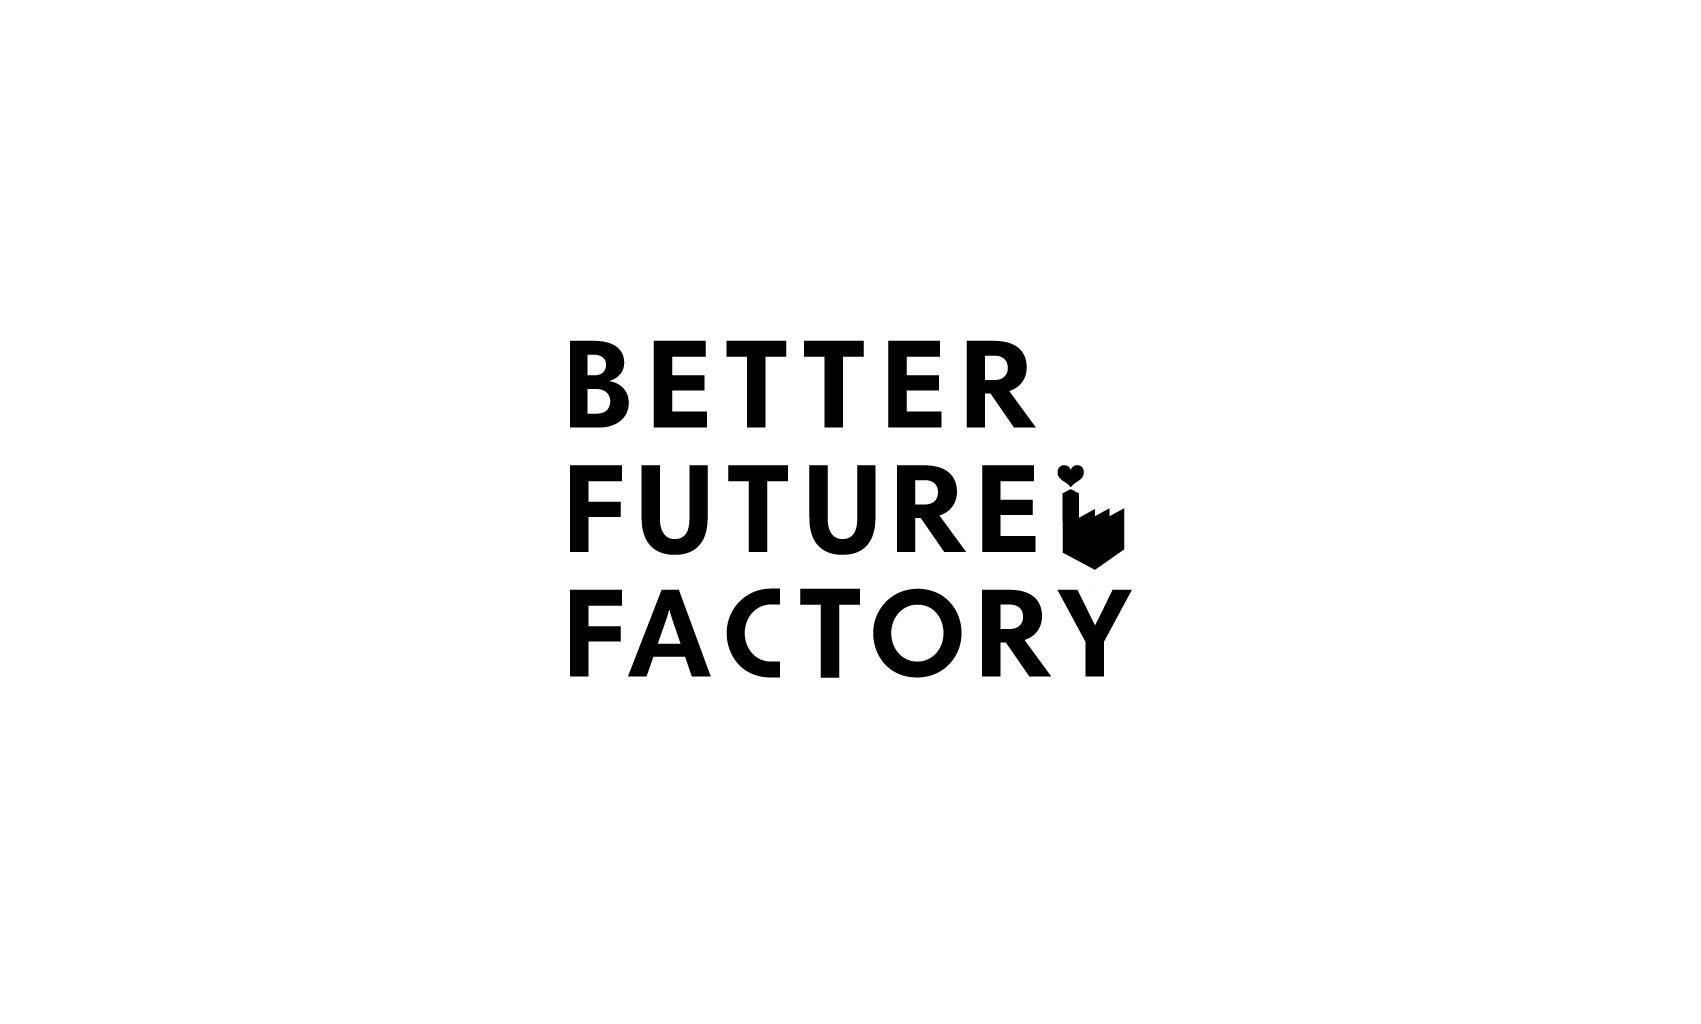 https://europeanplasticspact.org/wp-content/uploads/2021/05/better-future-factory_logo.jpg